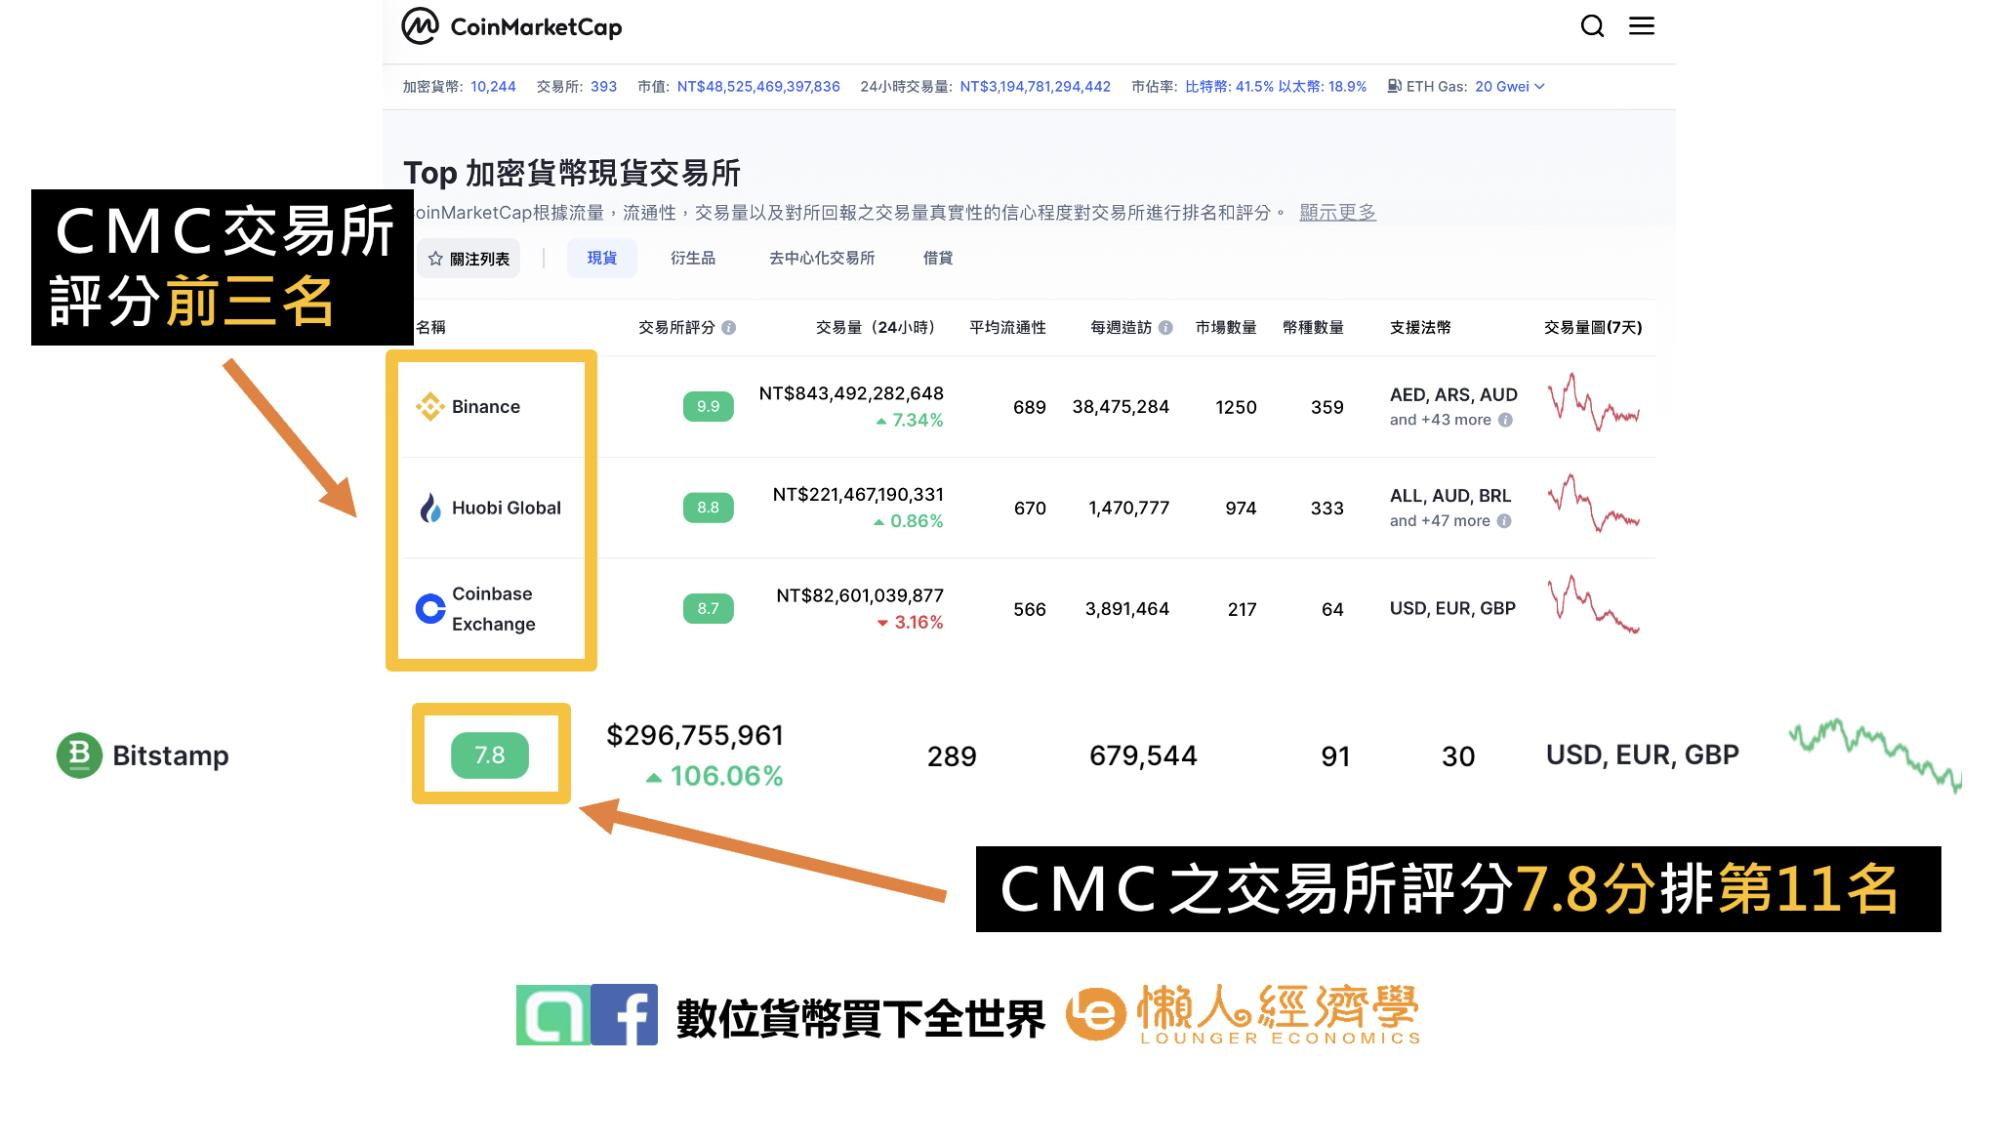 CMC加密貨幣現貨交易所排名:Bitstamp交易所評分7.8分,排名第11名